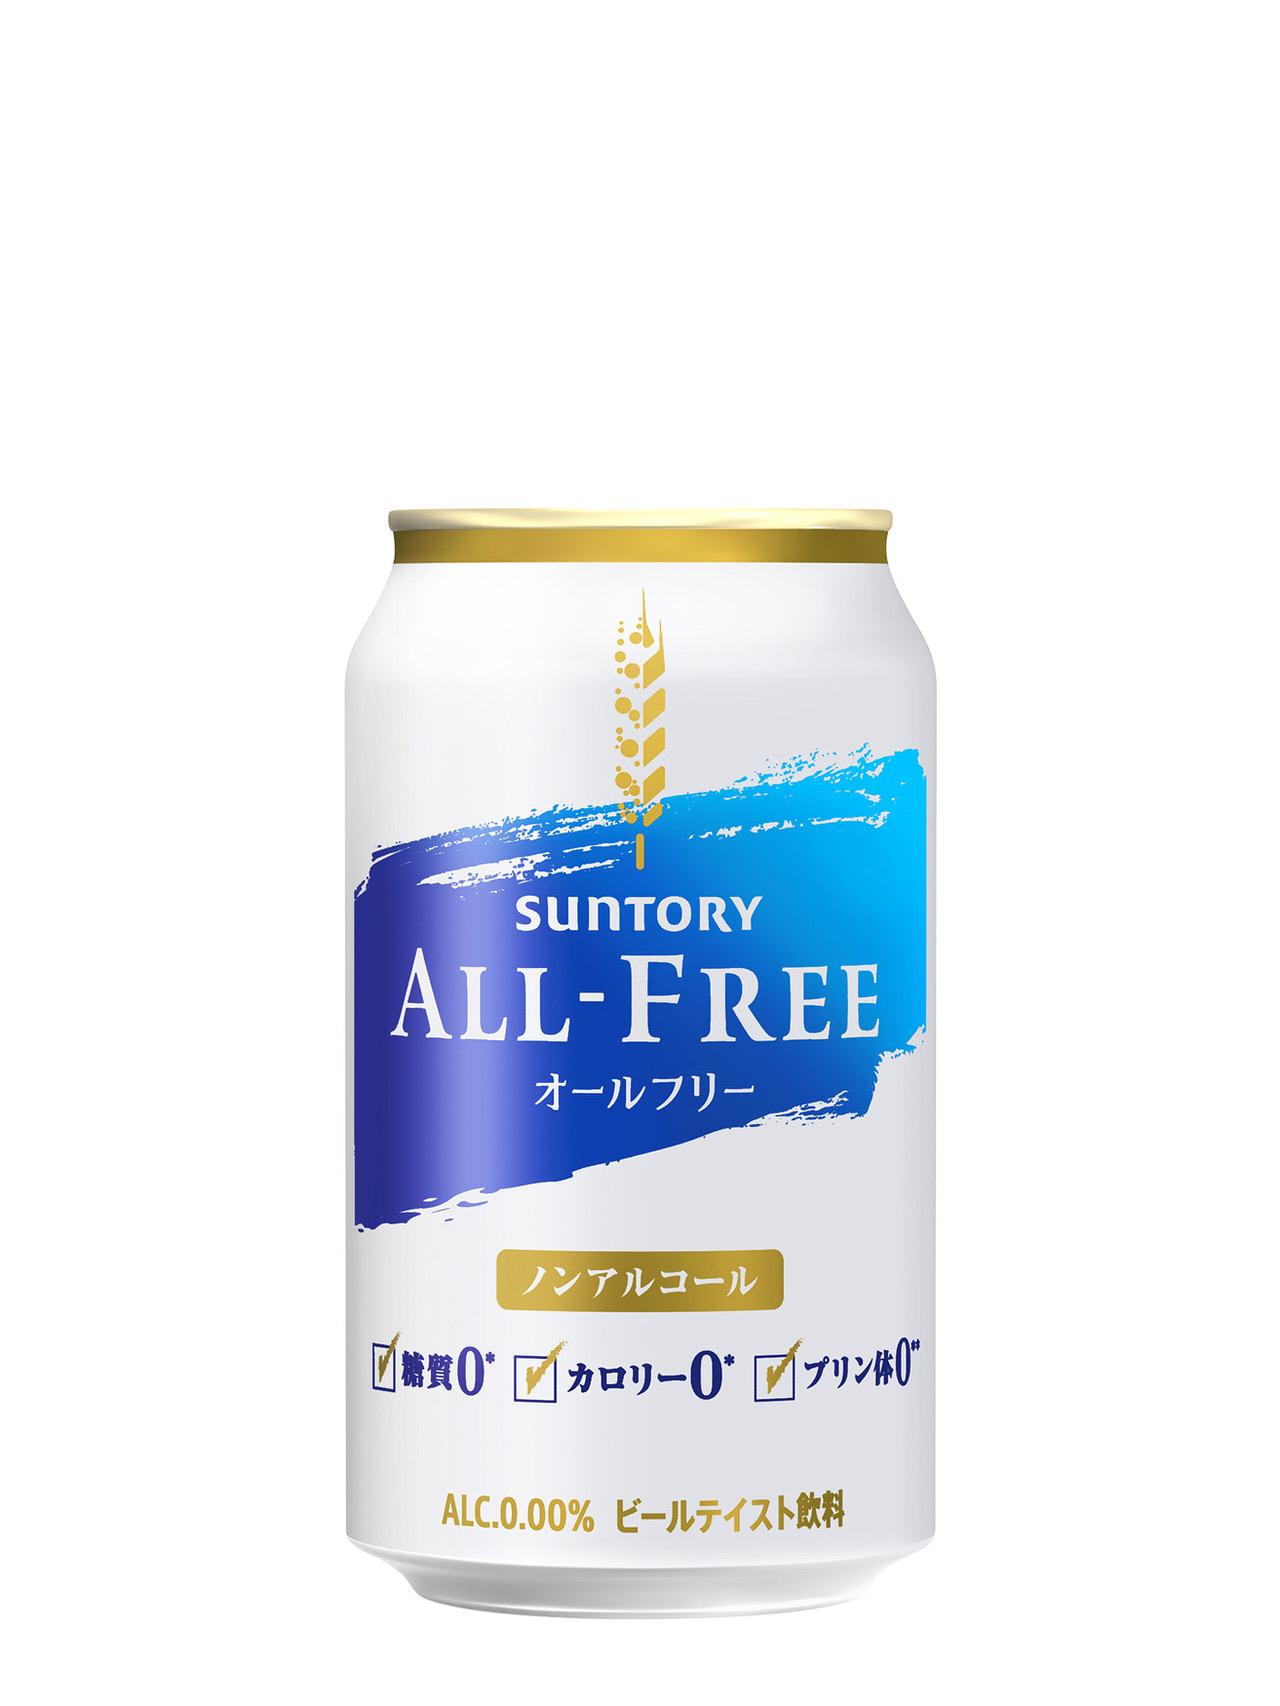 All free renewal 202012 3